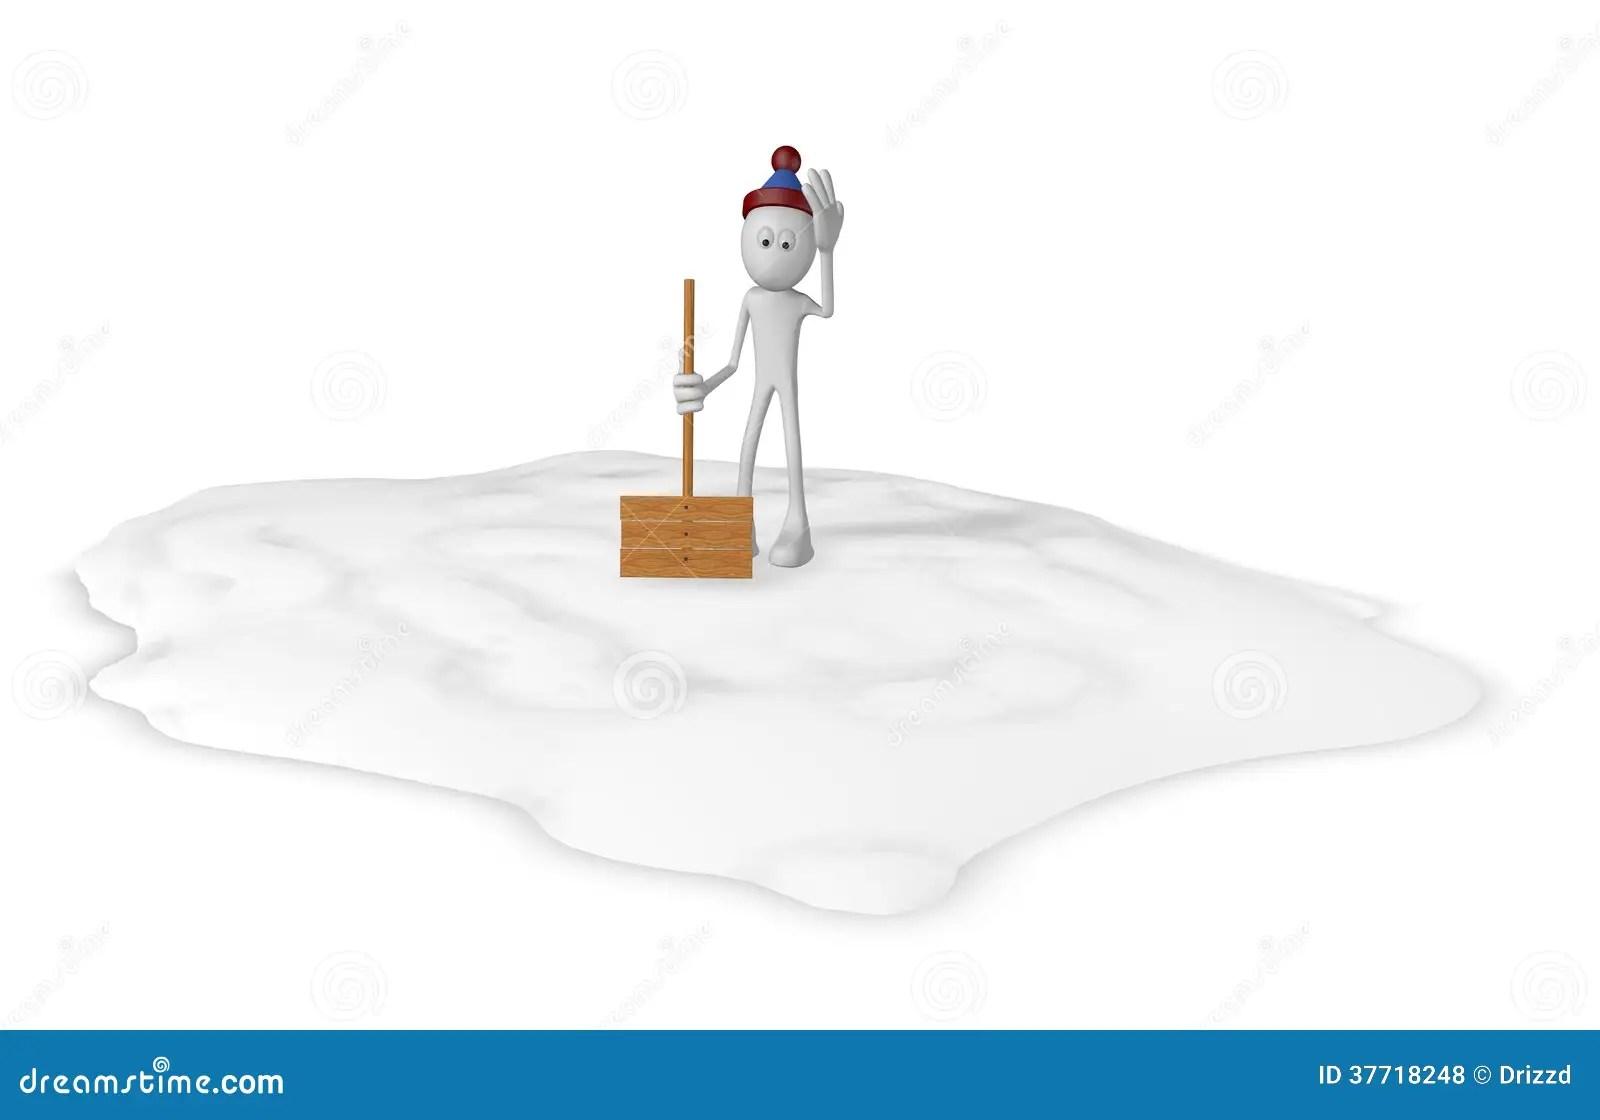 Snow Shovel Royalty Free Stock Photos